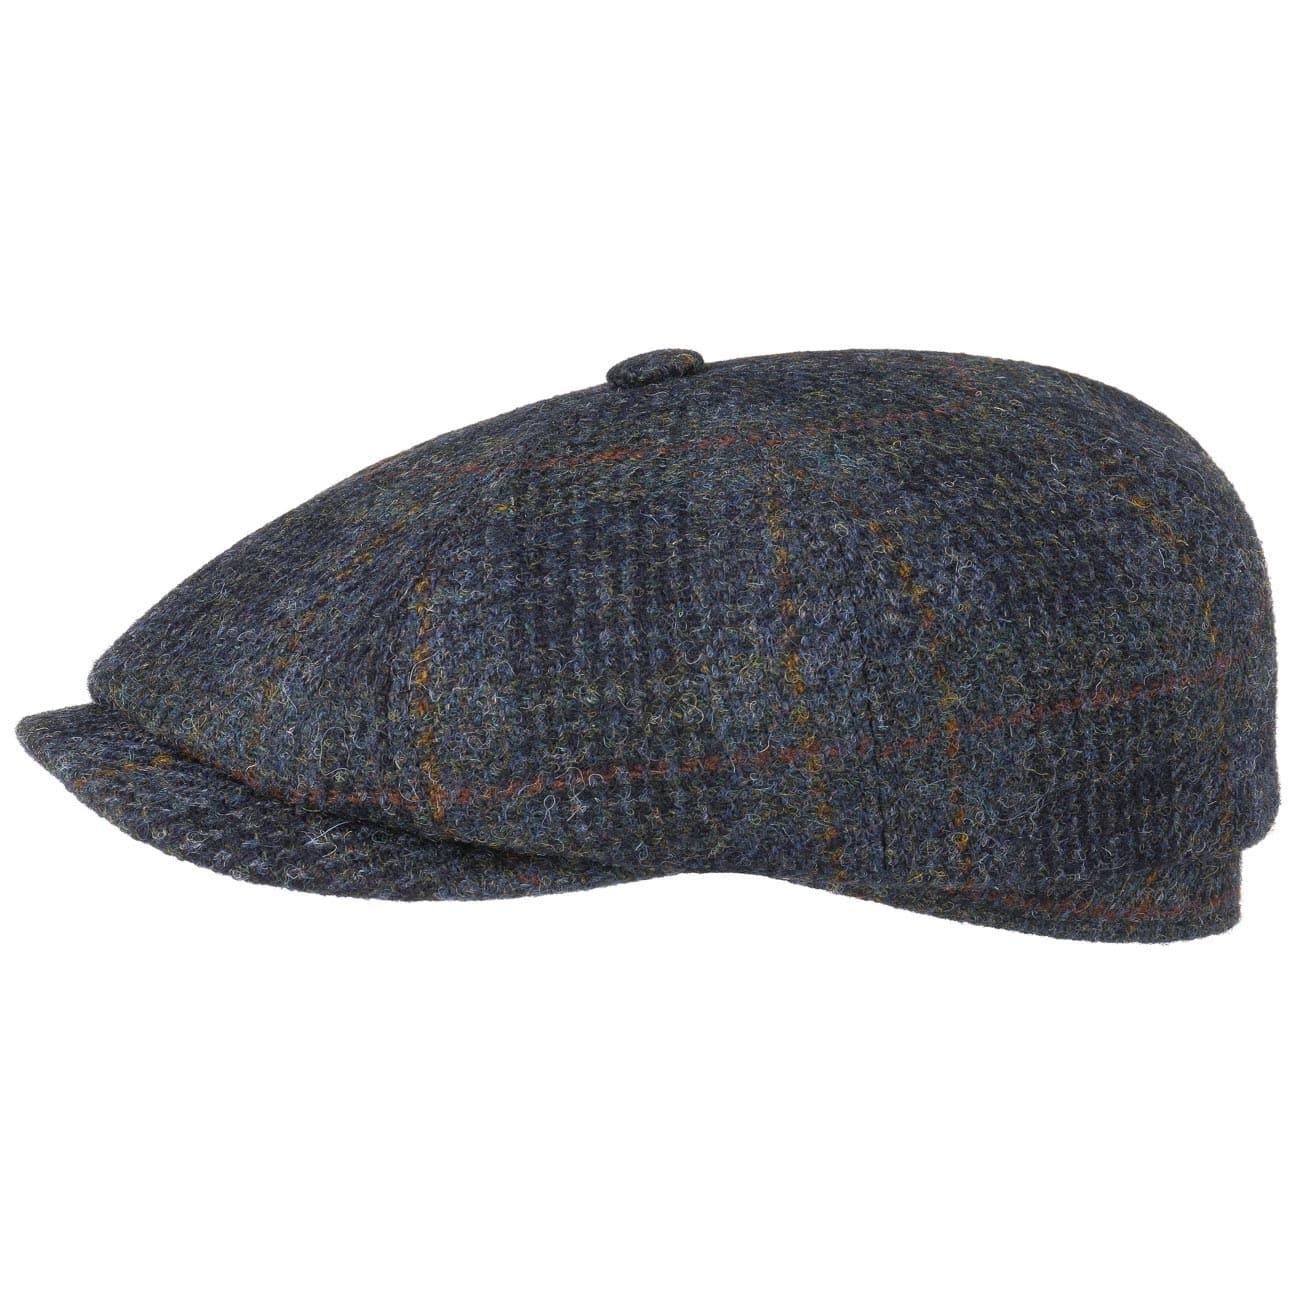 gorra-hatteras-harris-tweed-check-by-stetson, 129.00 EUR @ sombreroshop-es